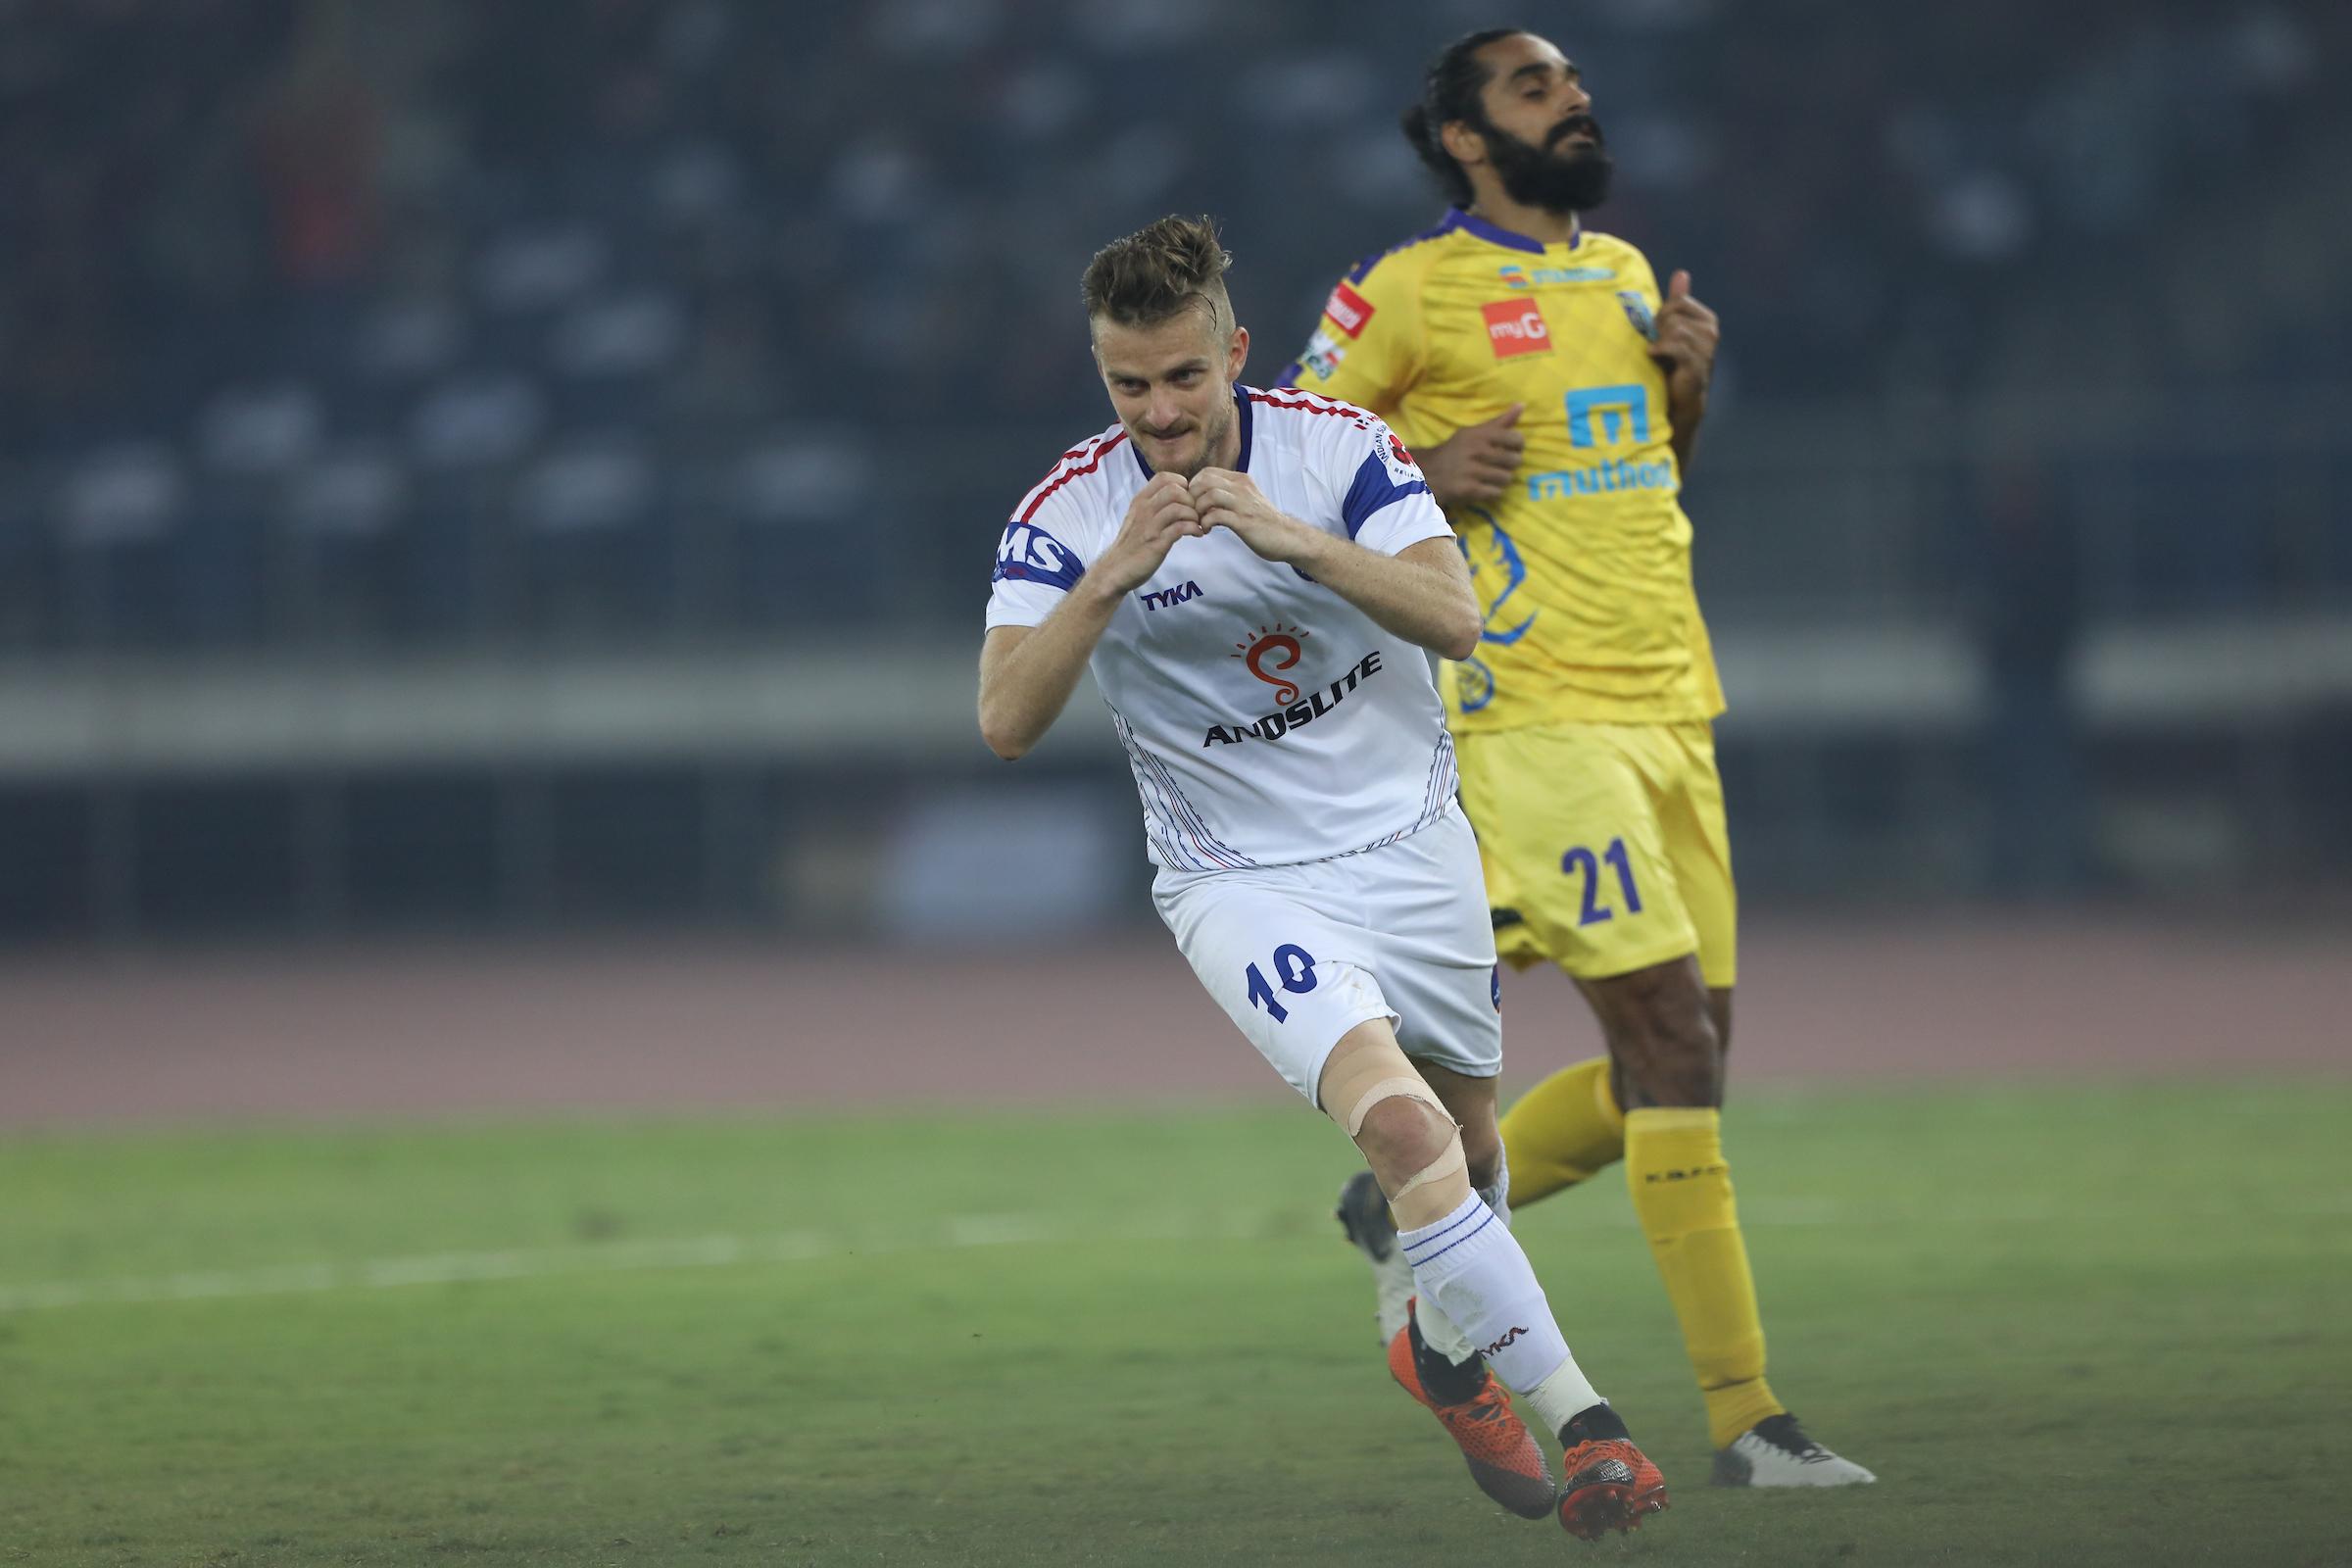 Rene Mihelic Delhi Dynamos Kerala Blasters